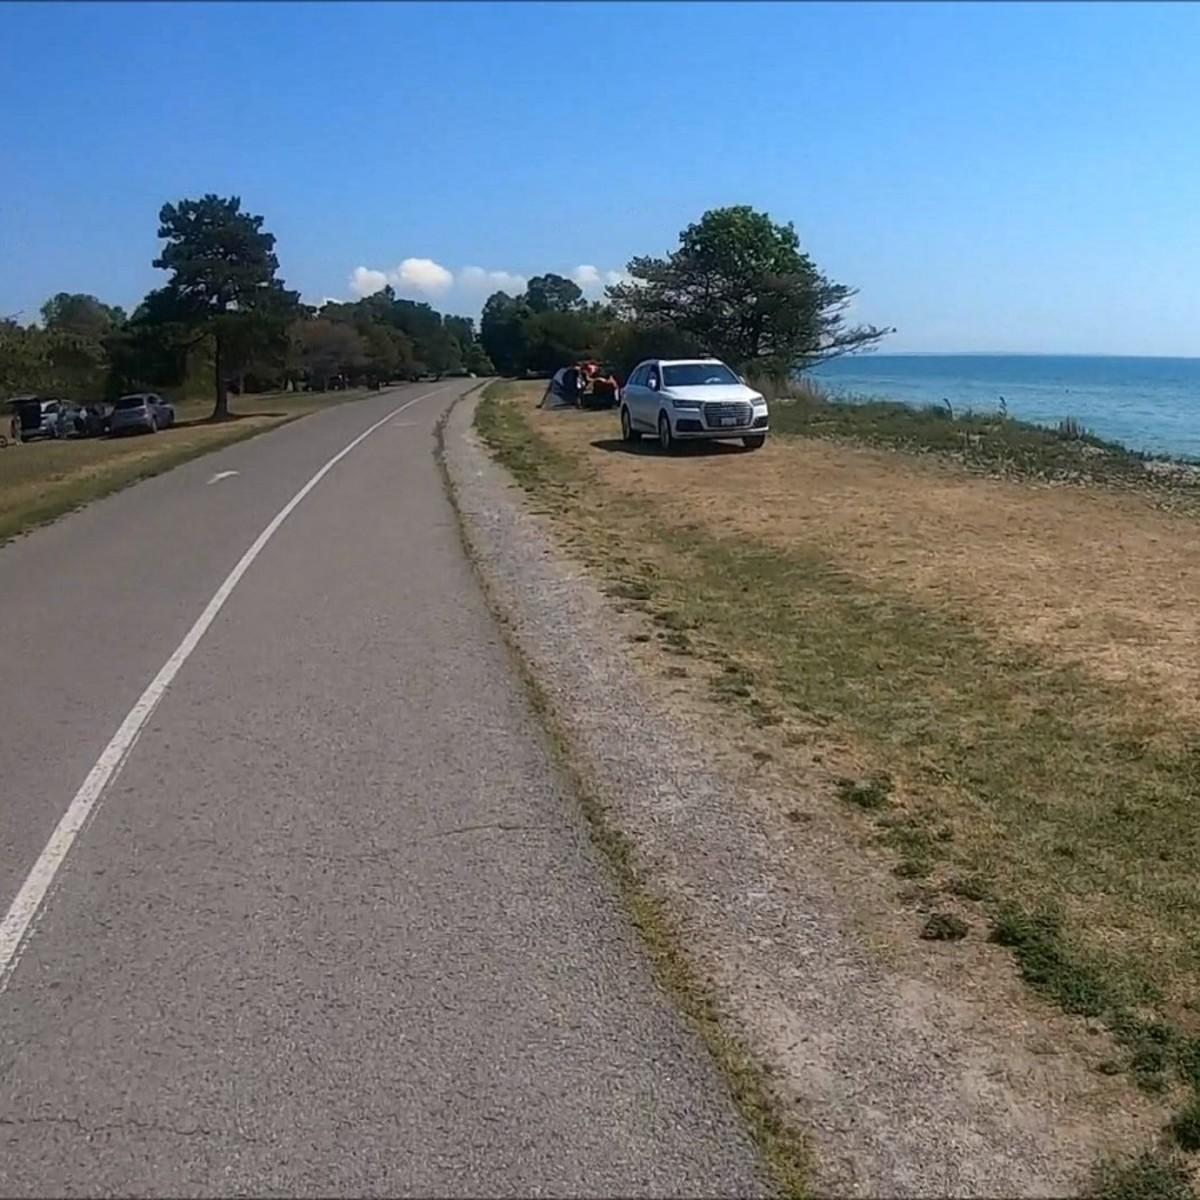 Recorded my bike ride around Presqu'ile provincial park with my new GoPro camera.